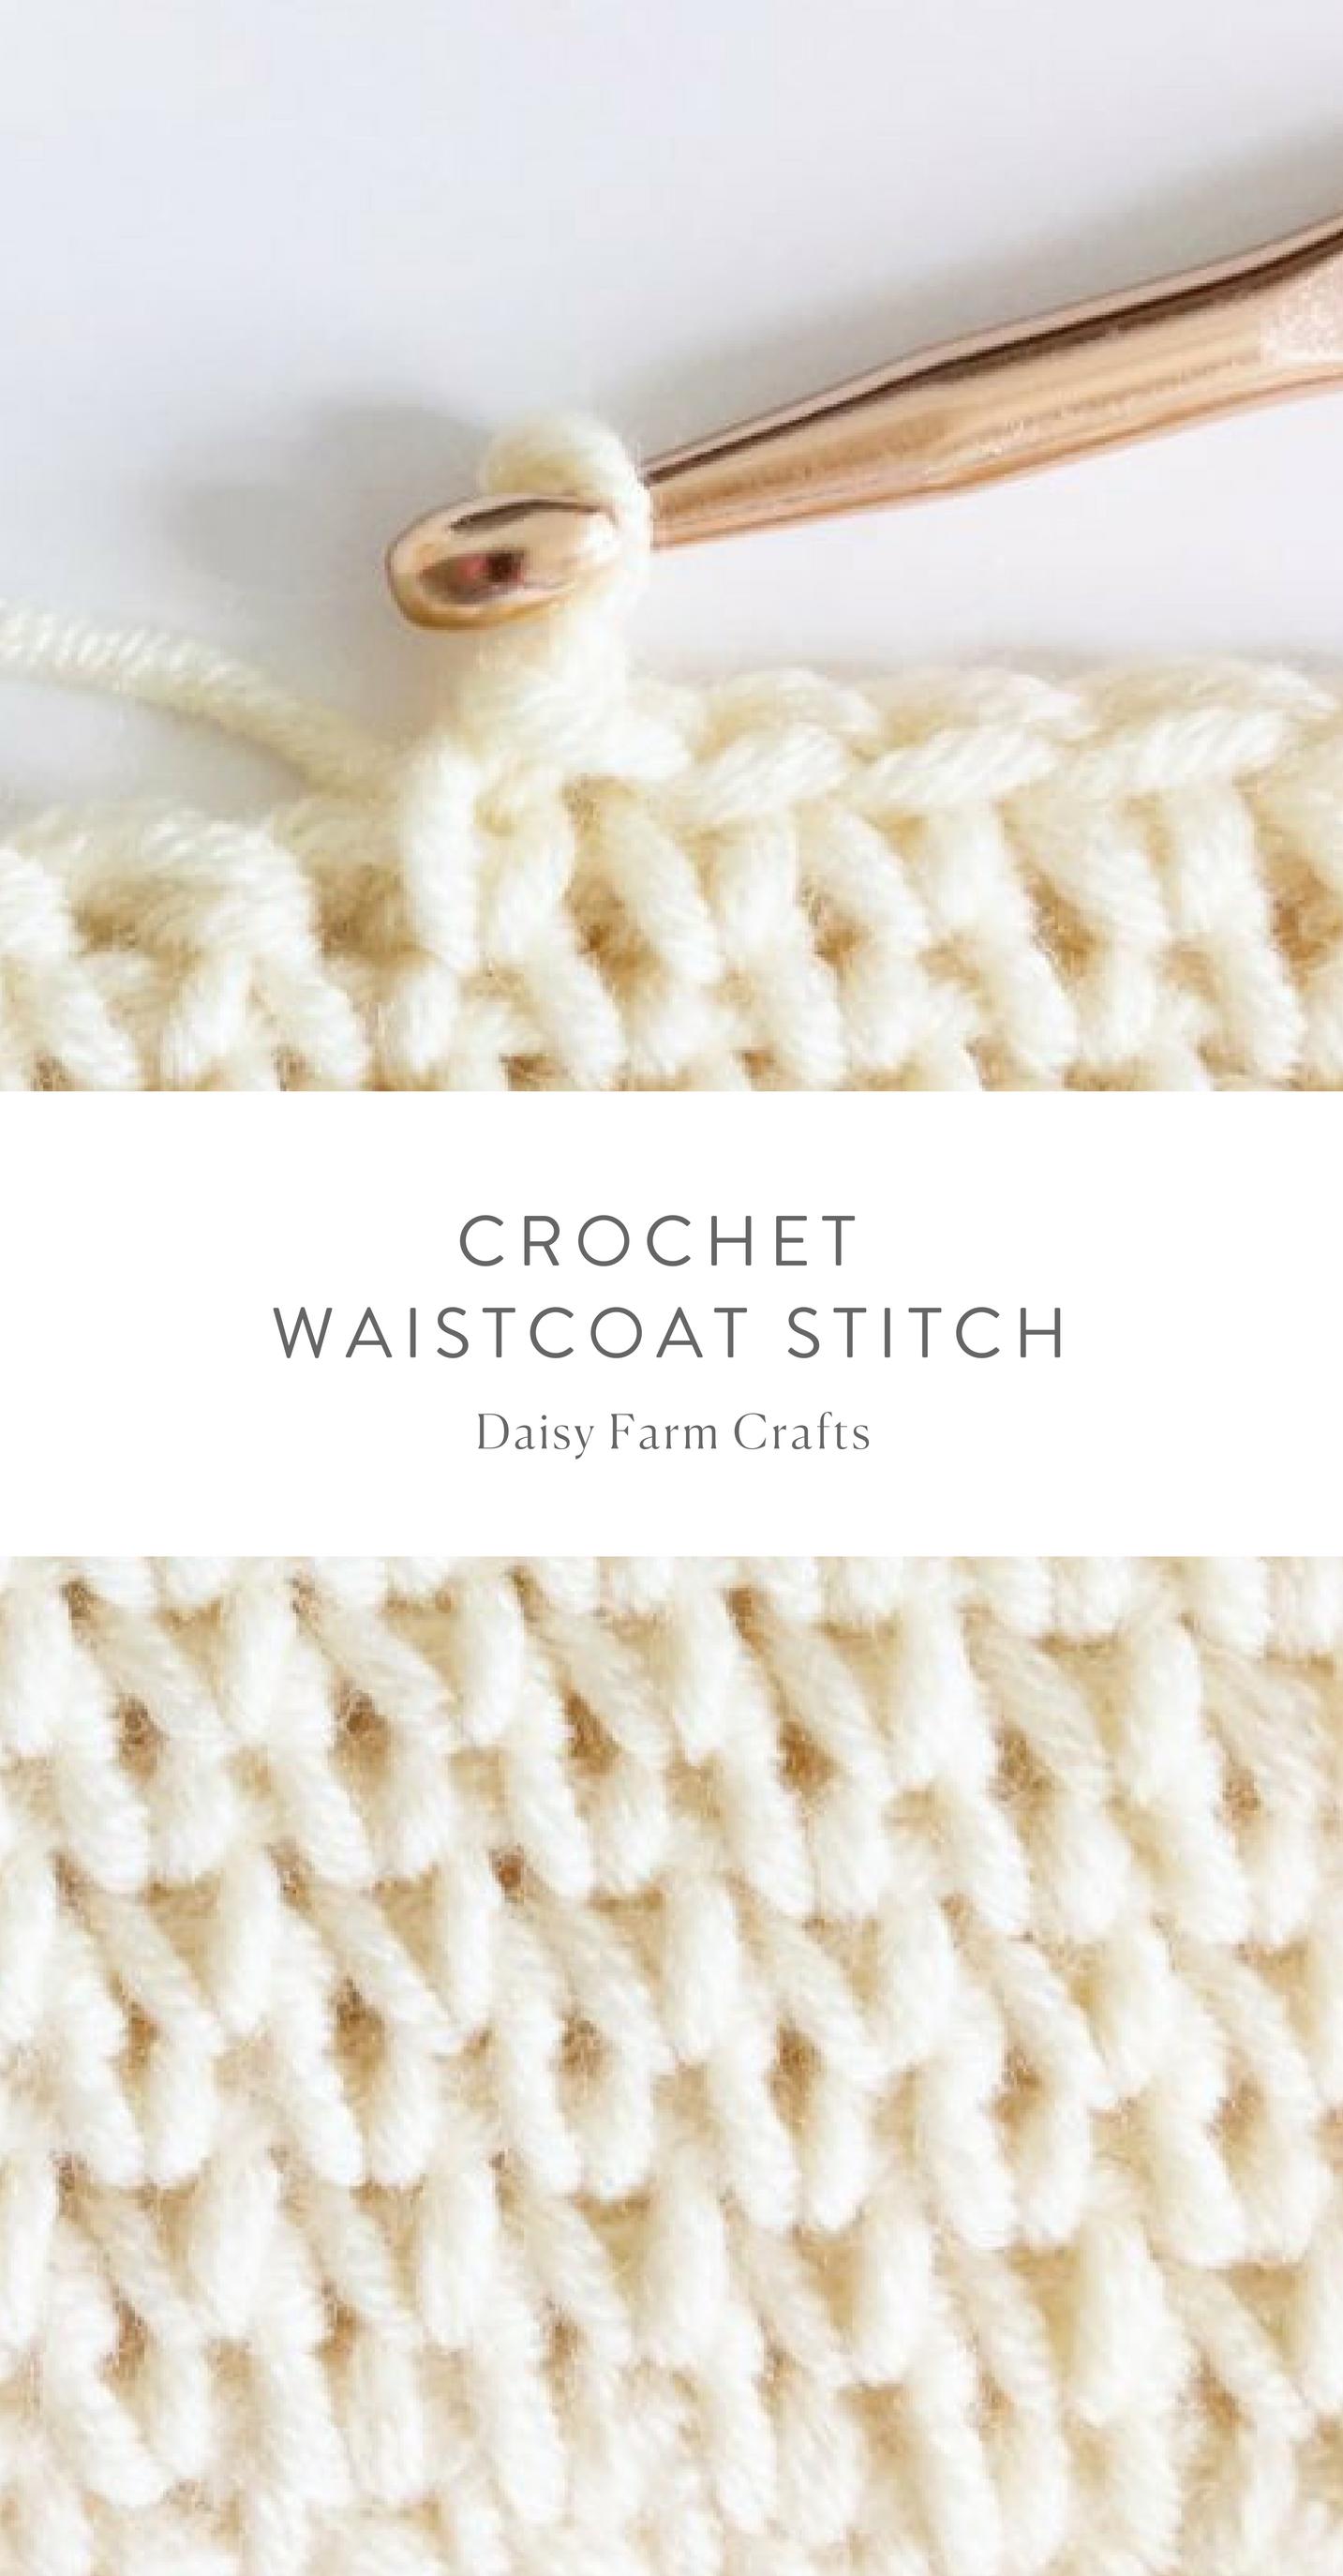 Crochet Waistcoat Stitch - Daisy Farm Crafts #crochet | DIY & Crafts ...